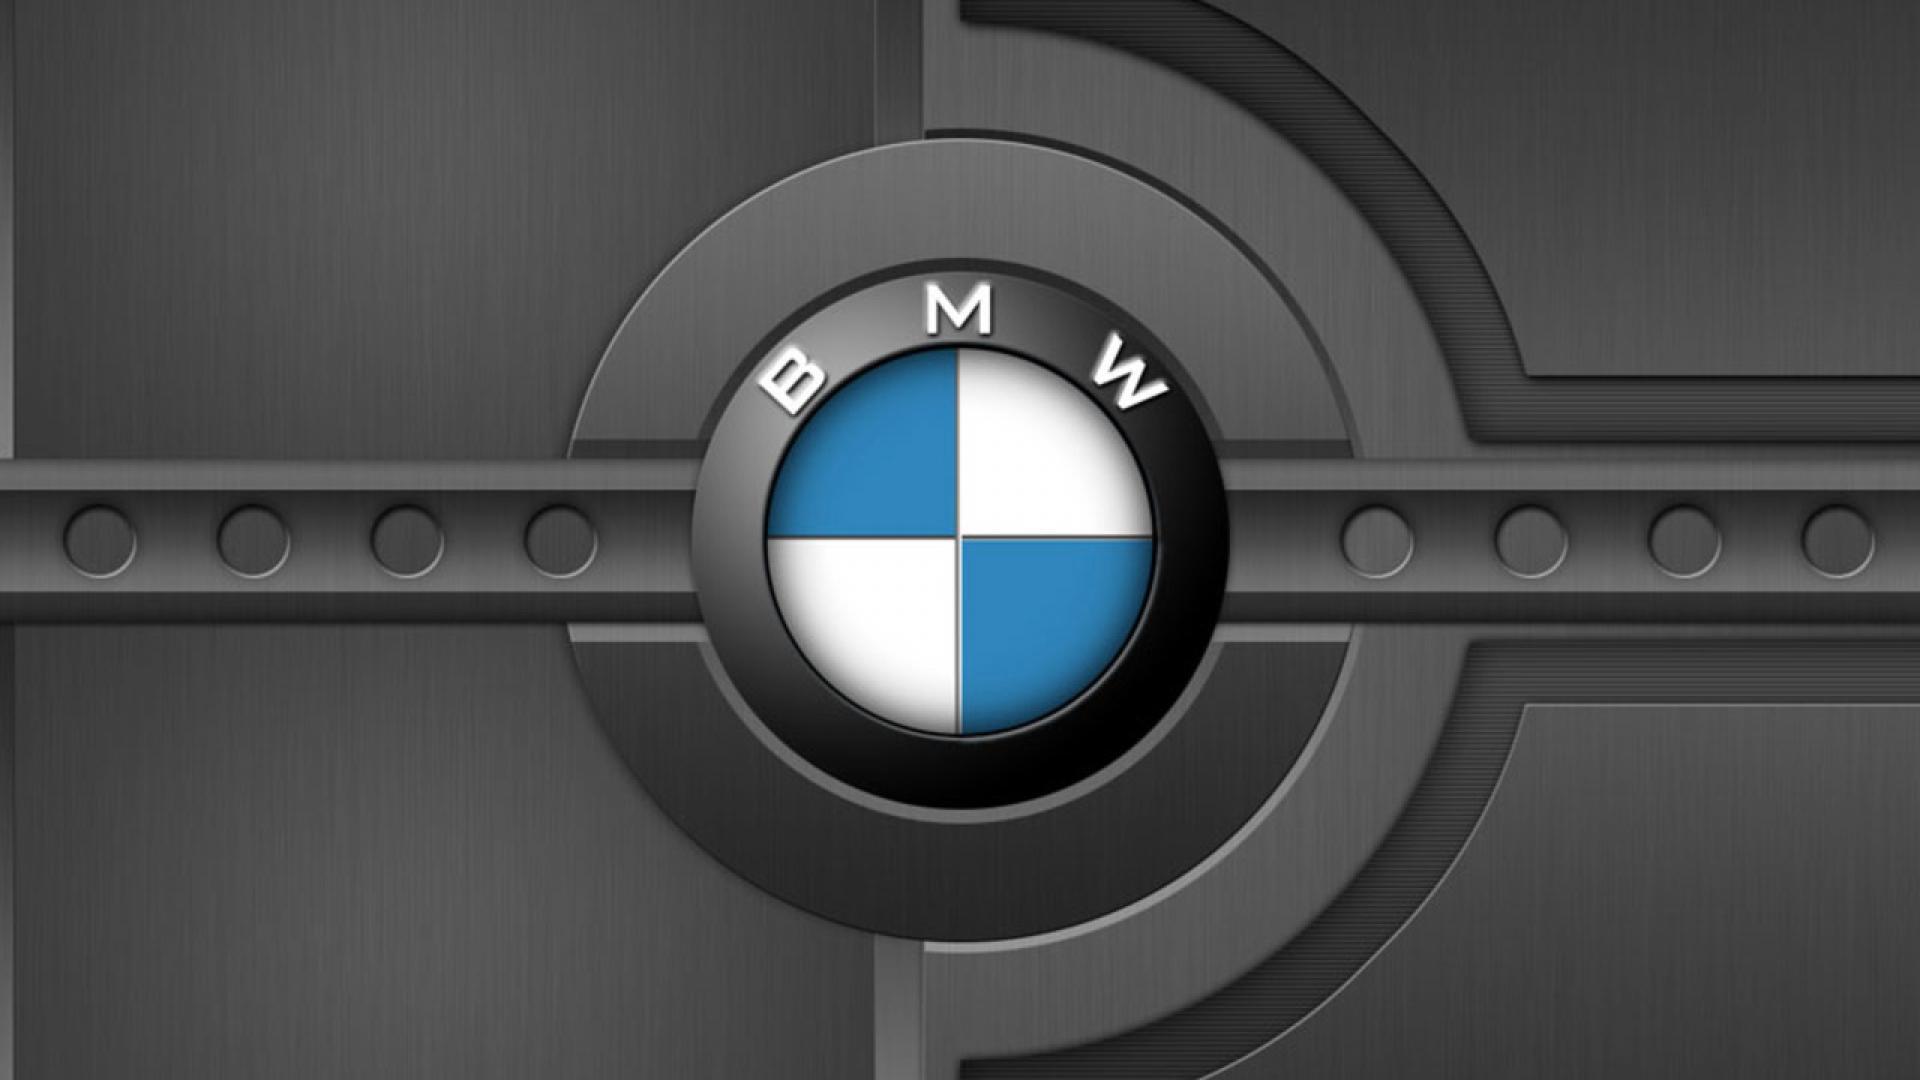 Bmw Logo Wallpaper Bmw Logo Wallpaper High Resolution 1920x1080 Download Hd Wallpaper Wallpapertip